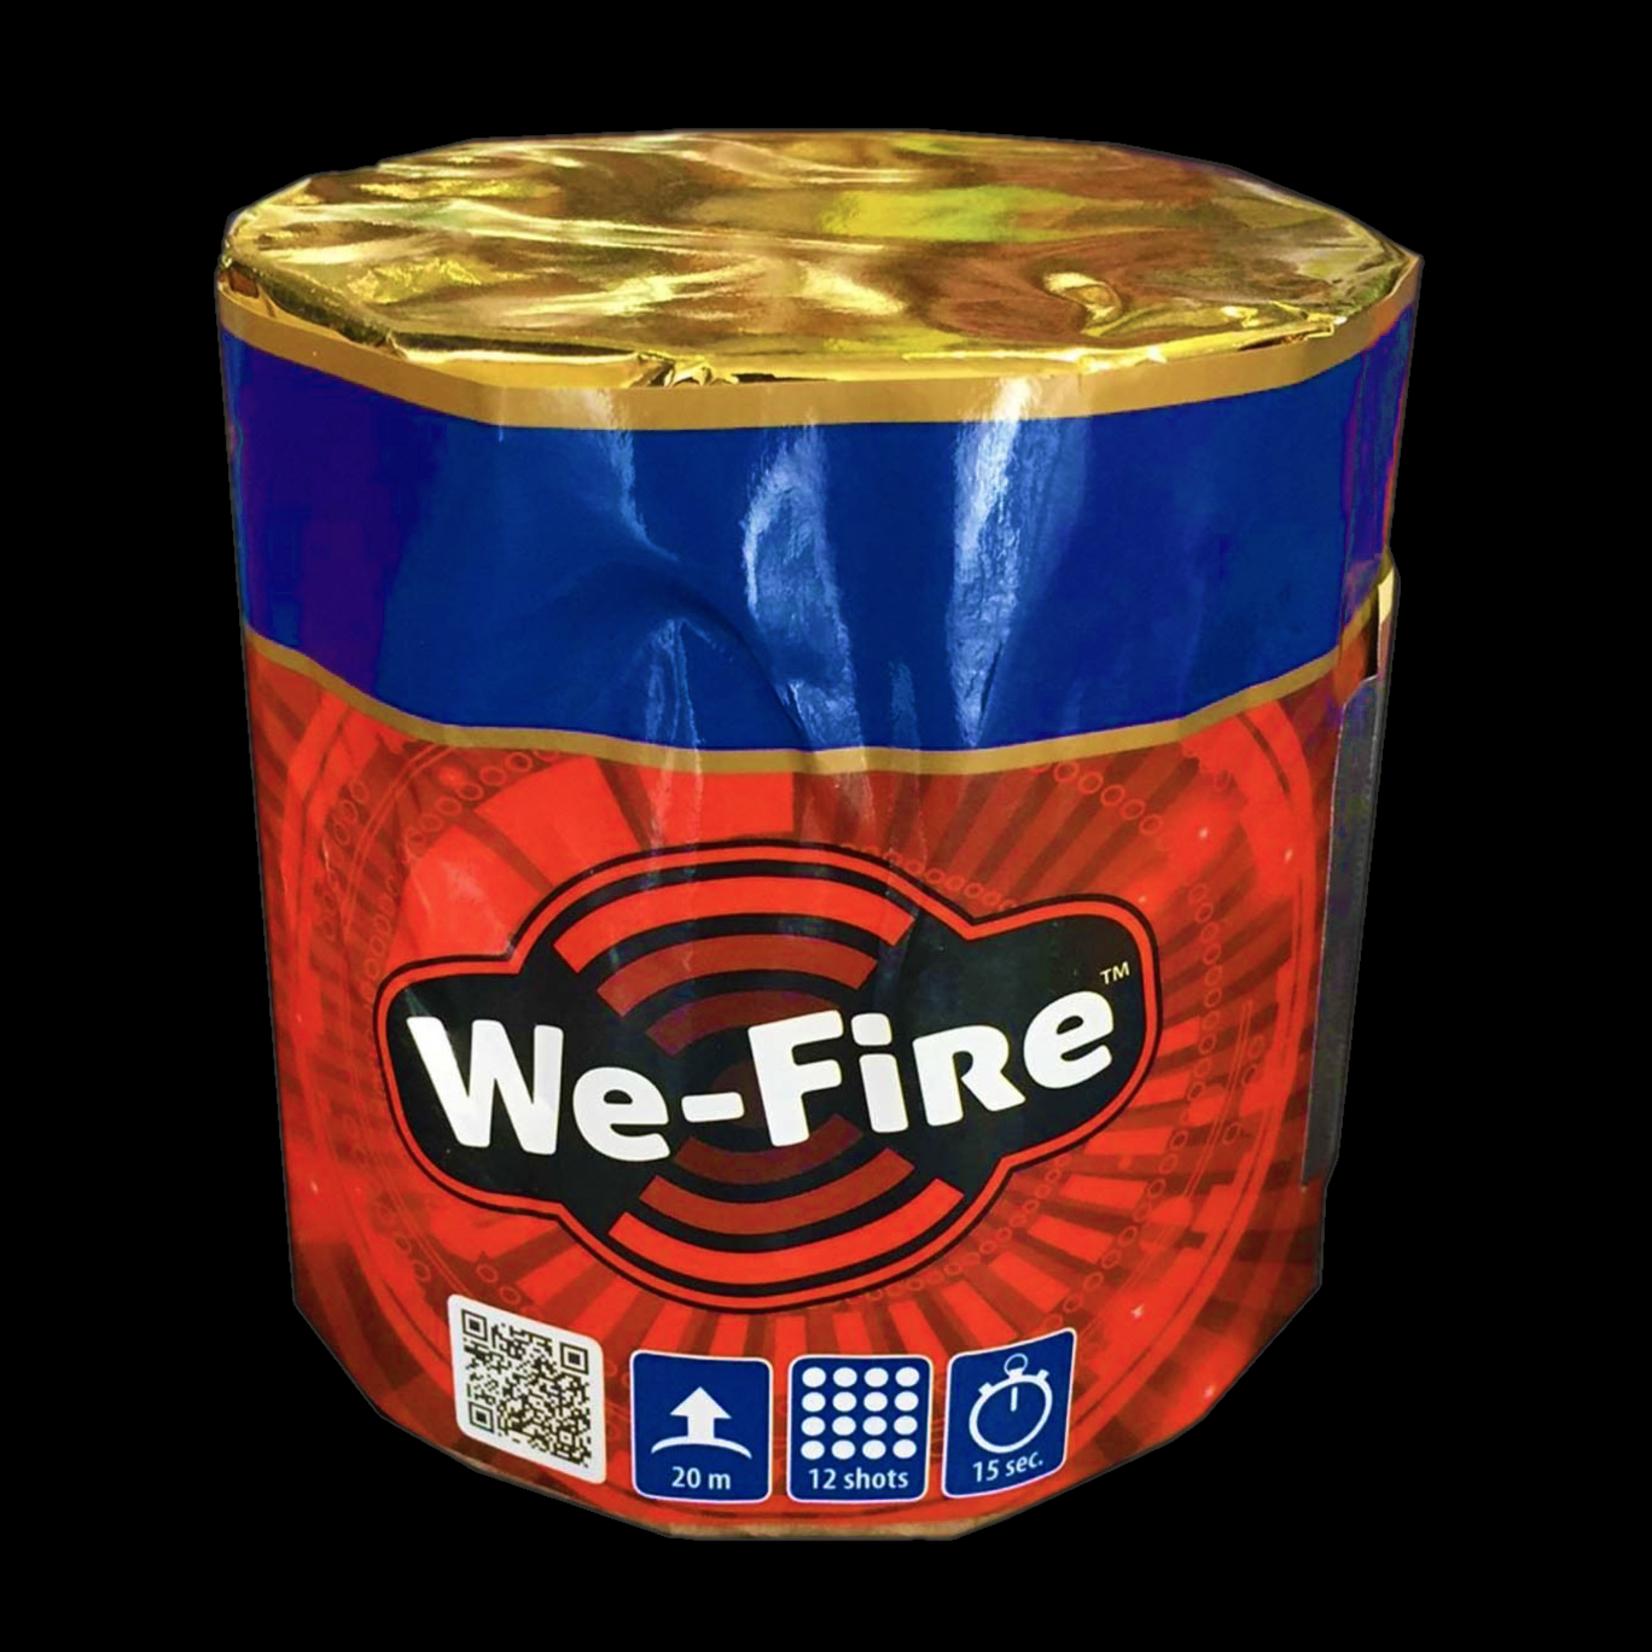 We-Fire